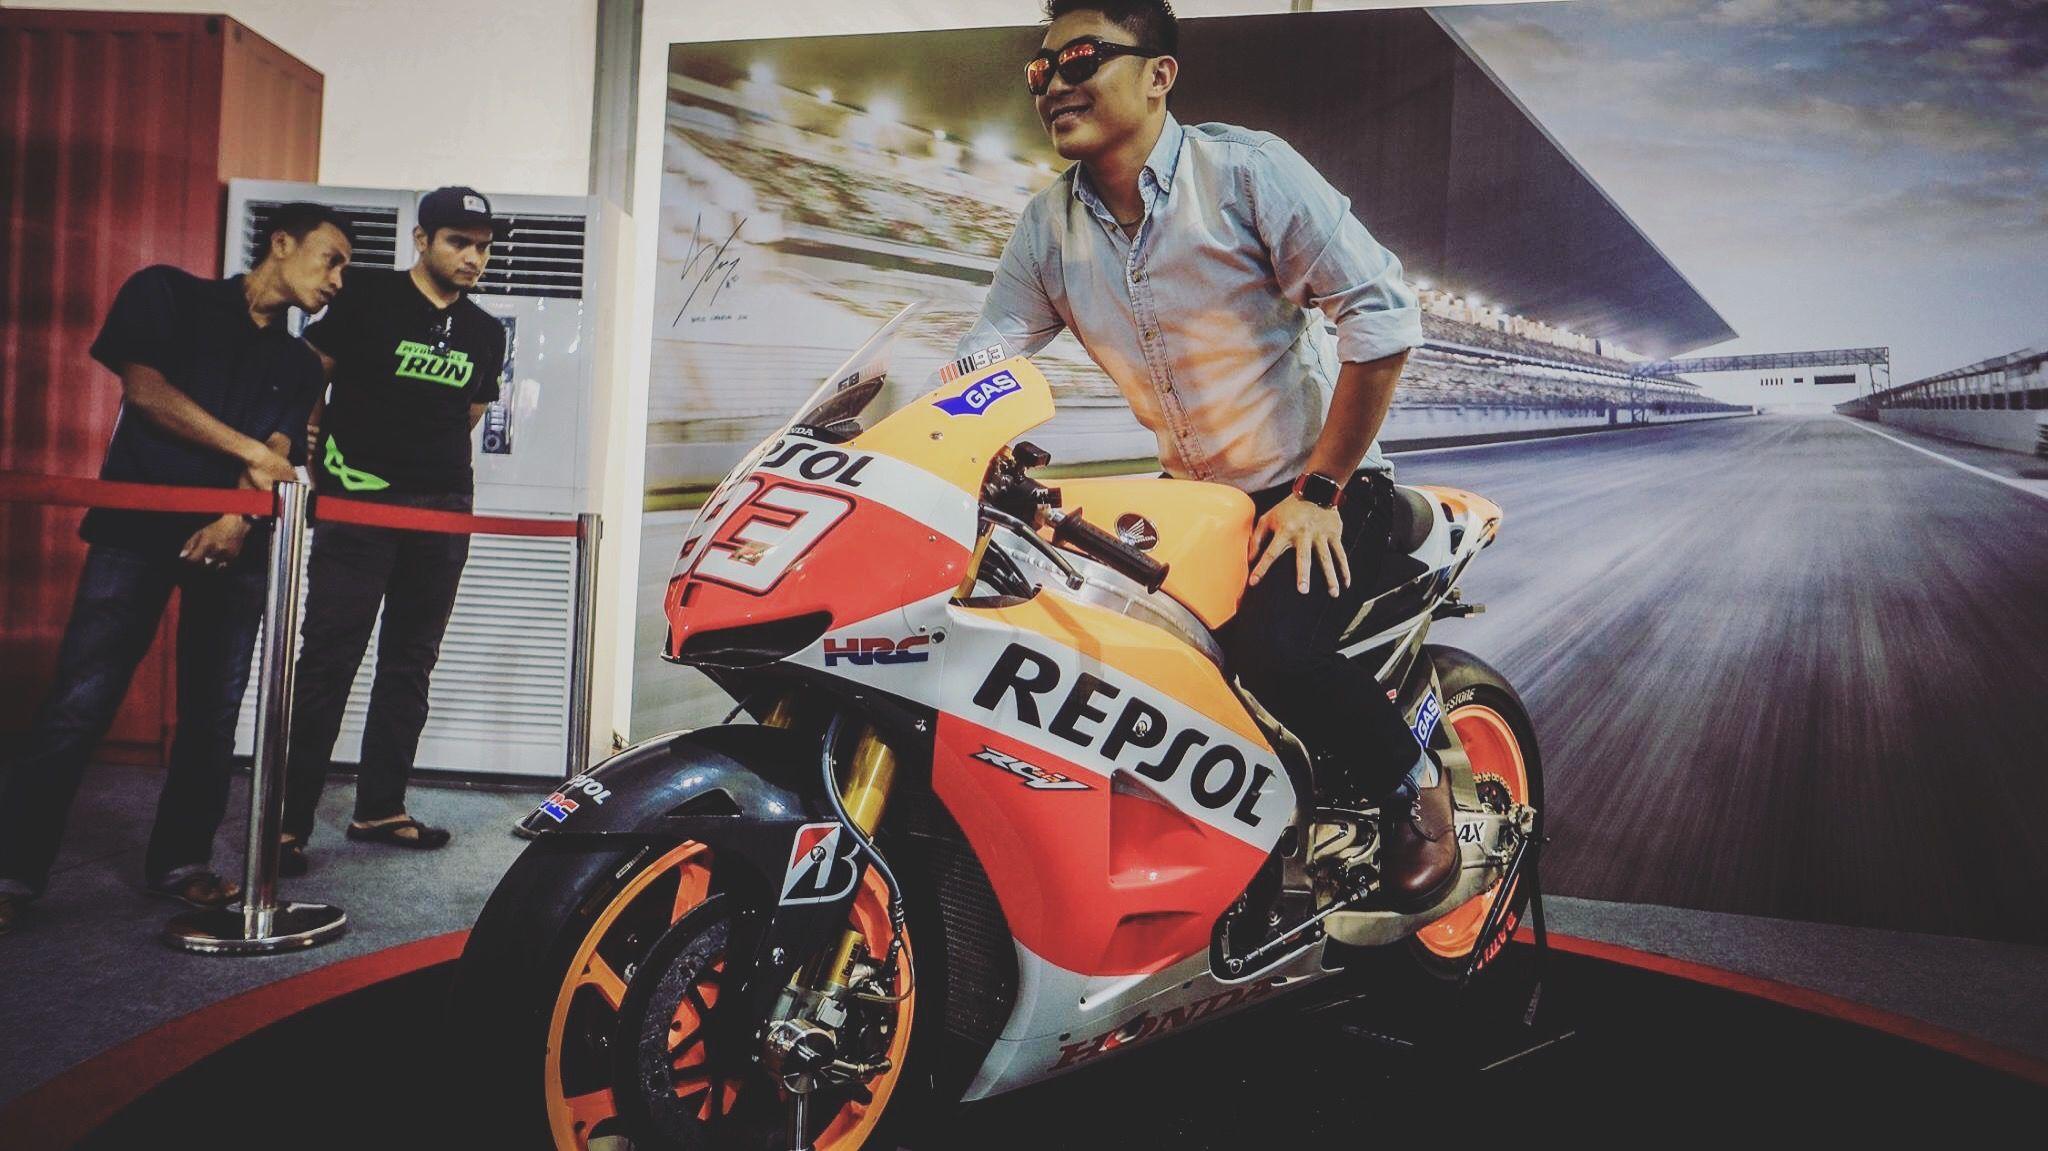 Ghim của Tommy Do trên Motorcycle